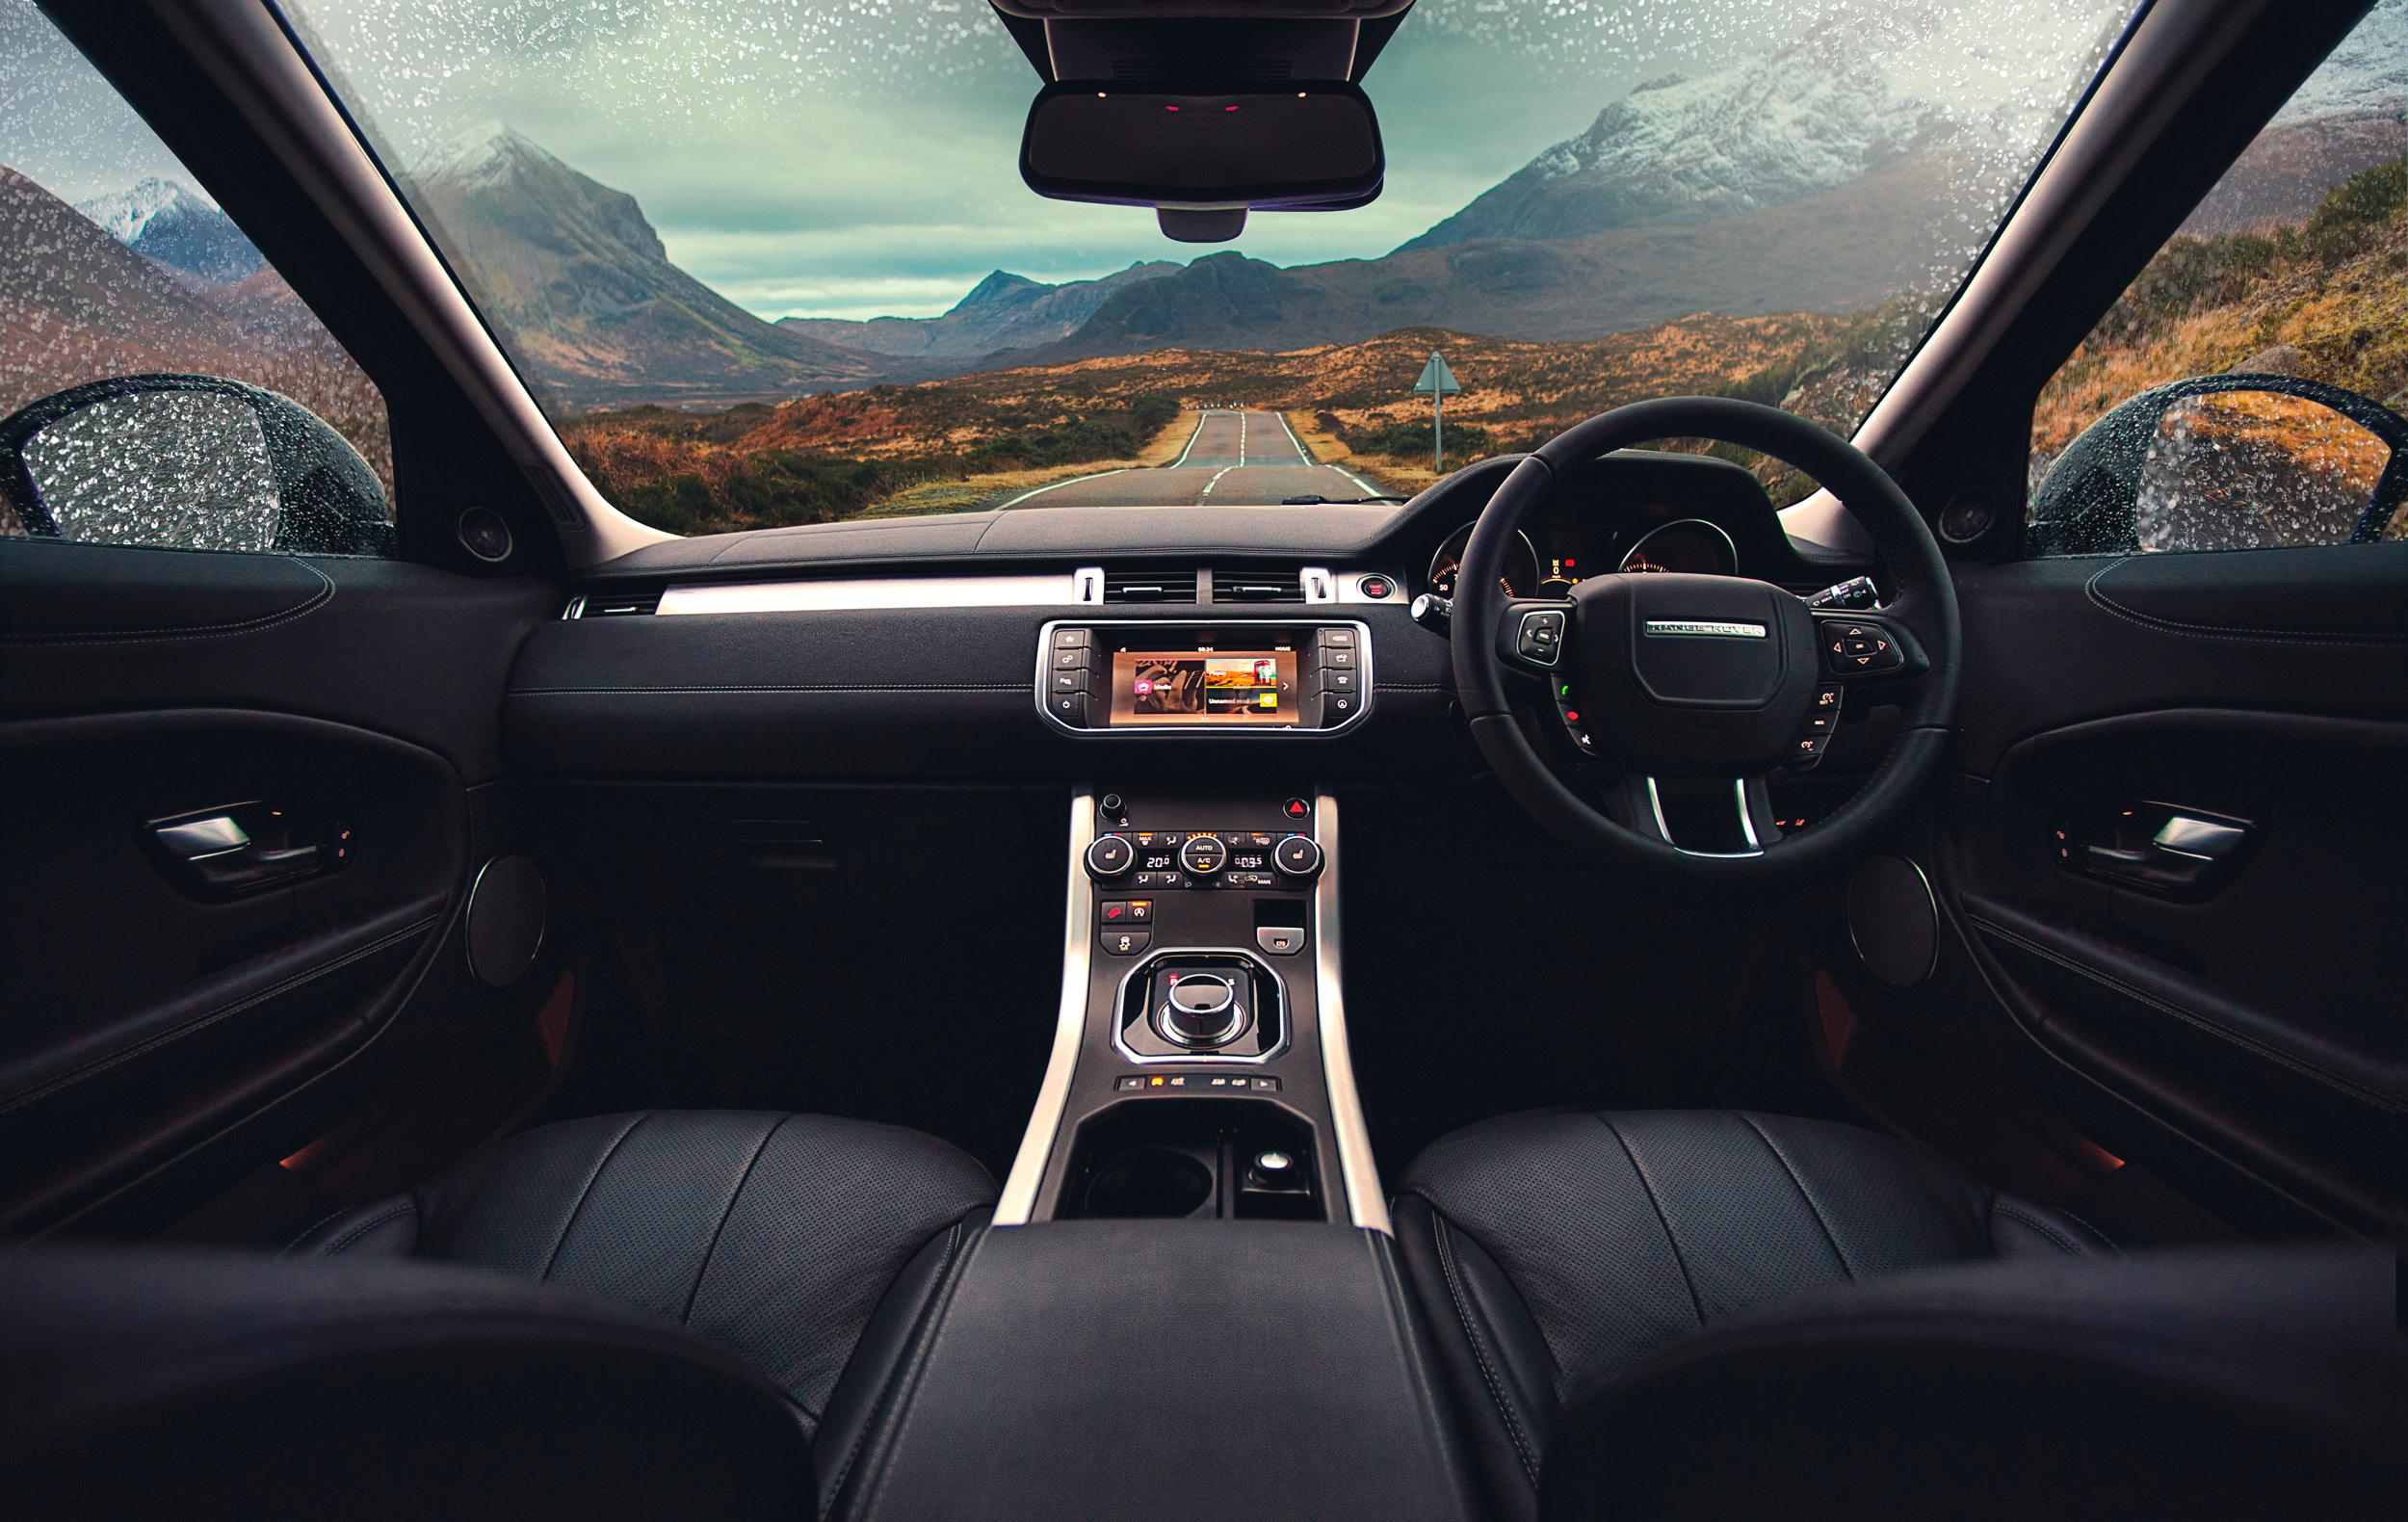 Land Rover  Range Rover Evoque Interior photography shot by Dean Wright